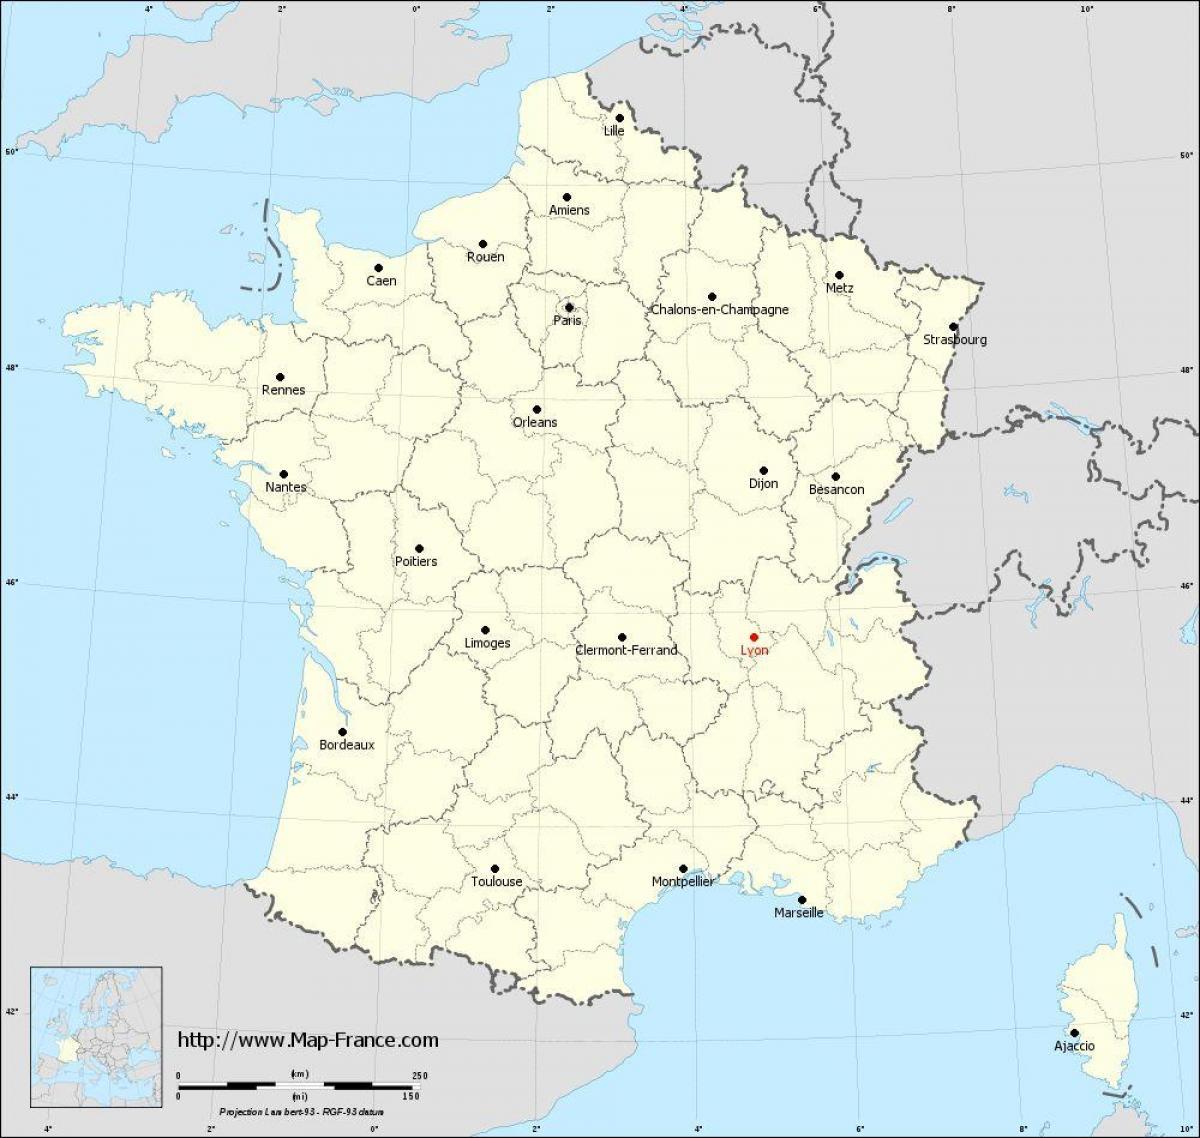 Lyon Ranska Kartta Lyon Kartalla Auvergne Rhone Alpes Ranska